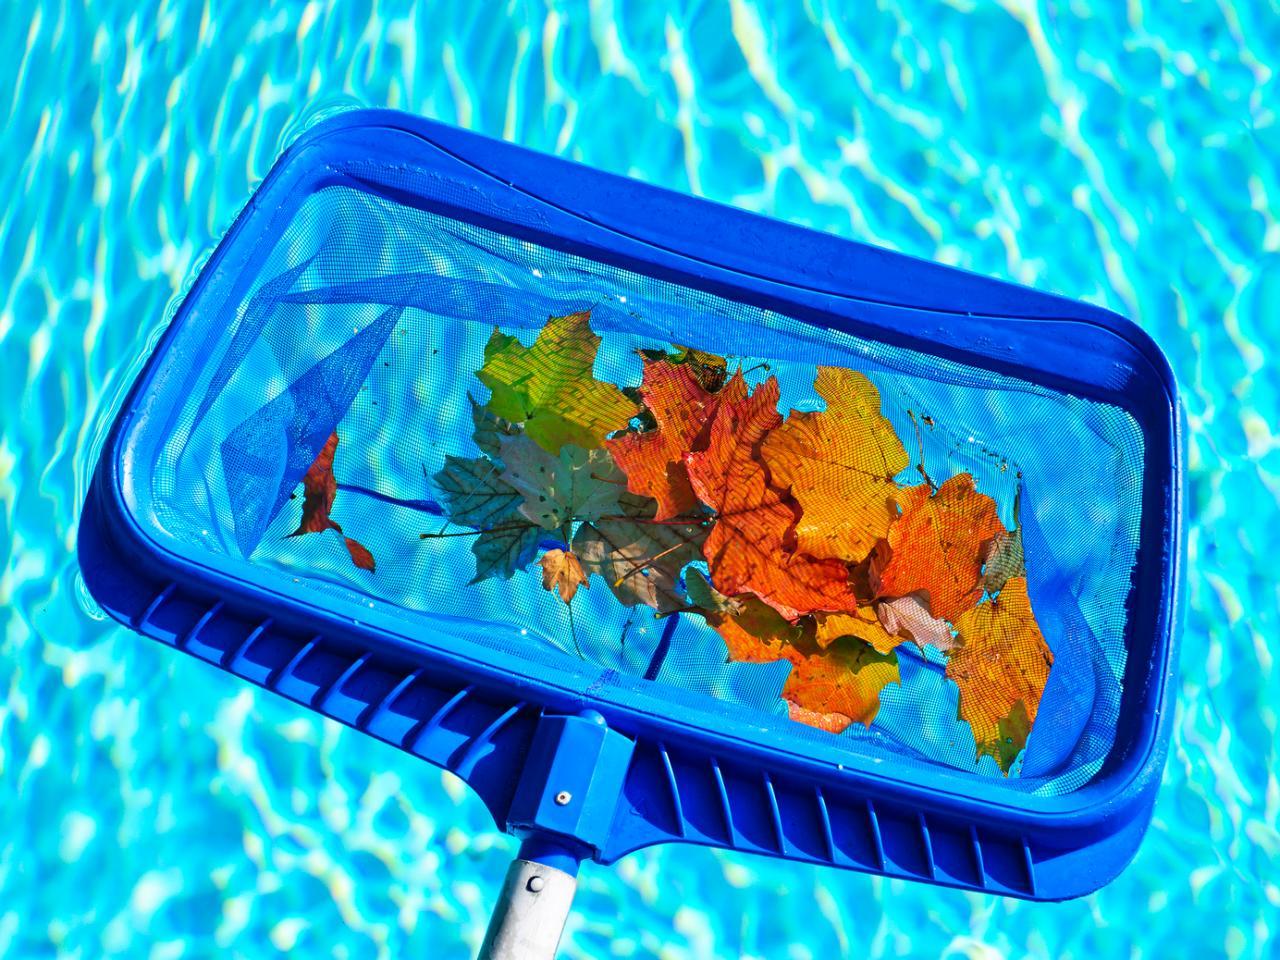 Swimming Pool Maintenance Hgtv